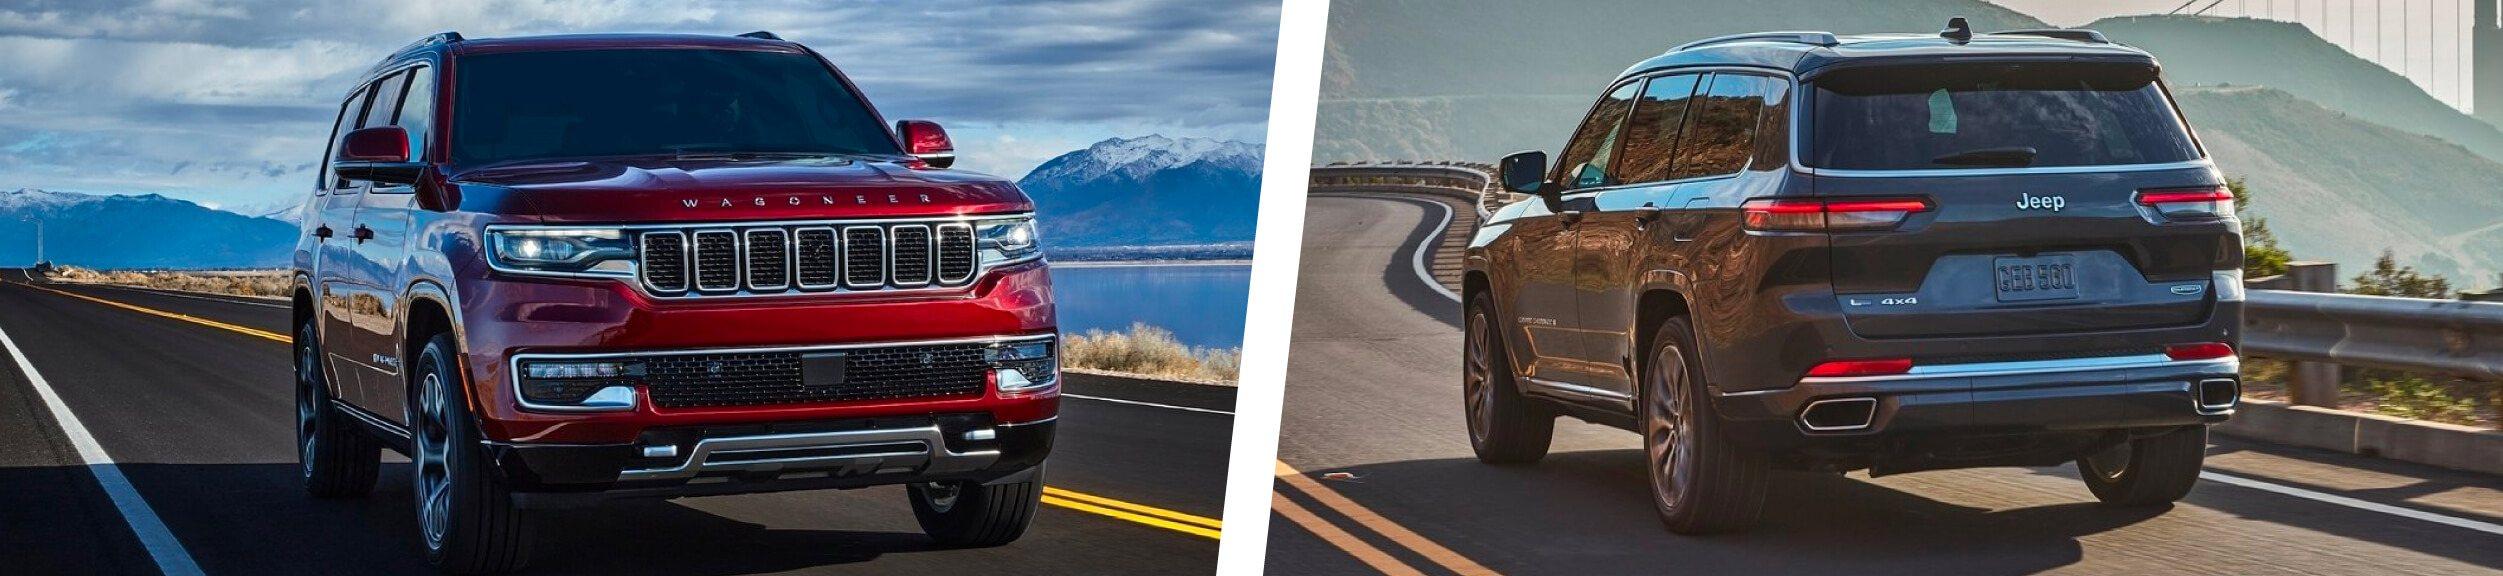 Full-Size Fun: The 2022 Jeep Grand Cherokee and Jeep Grand Wagoneer